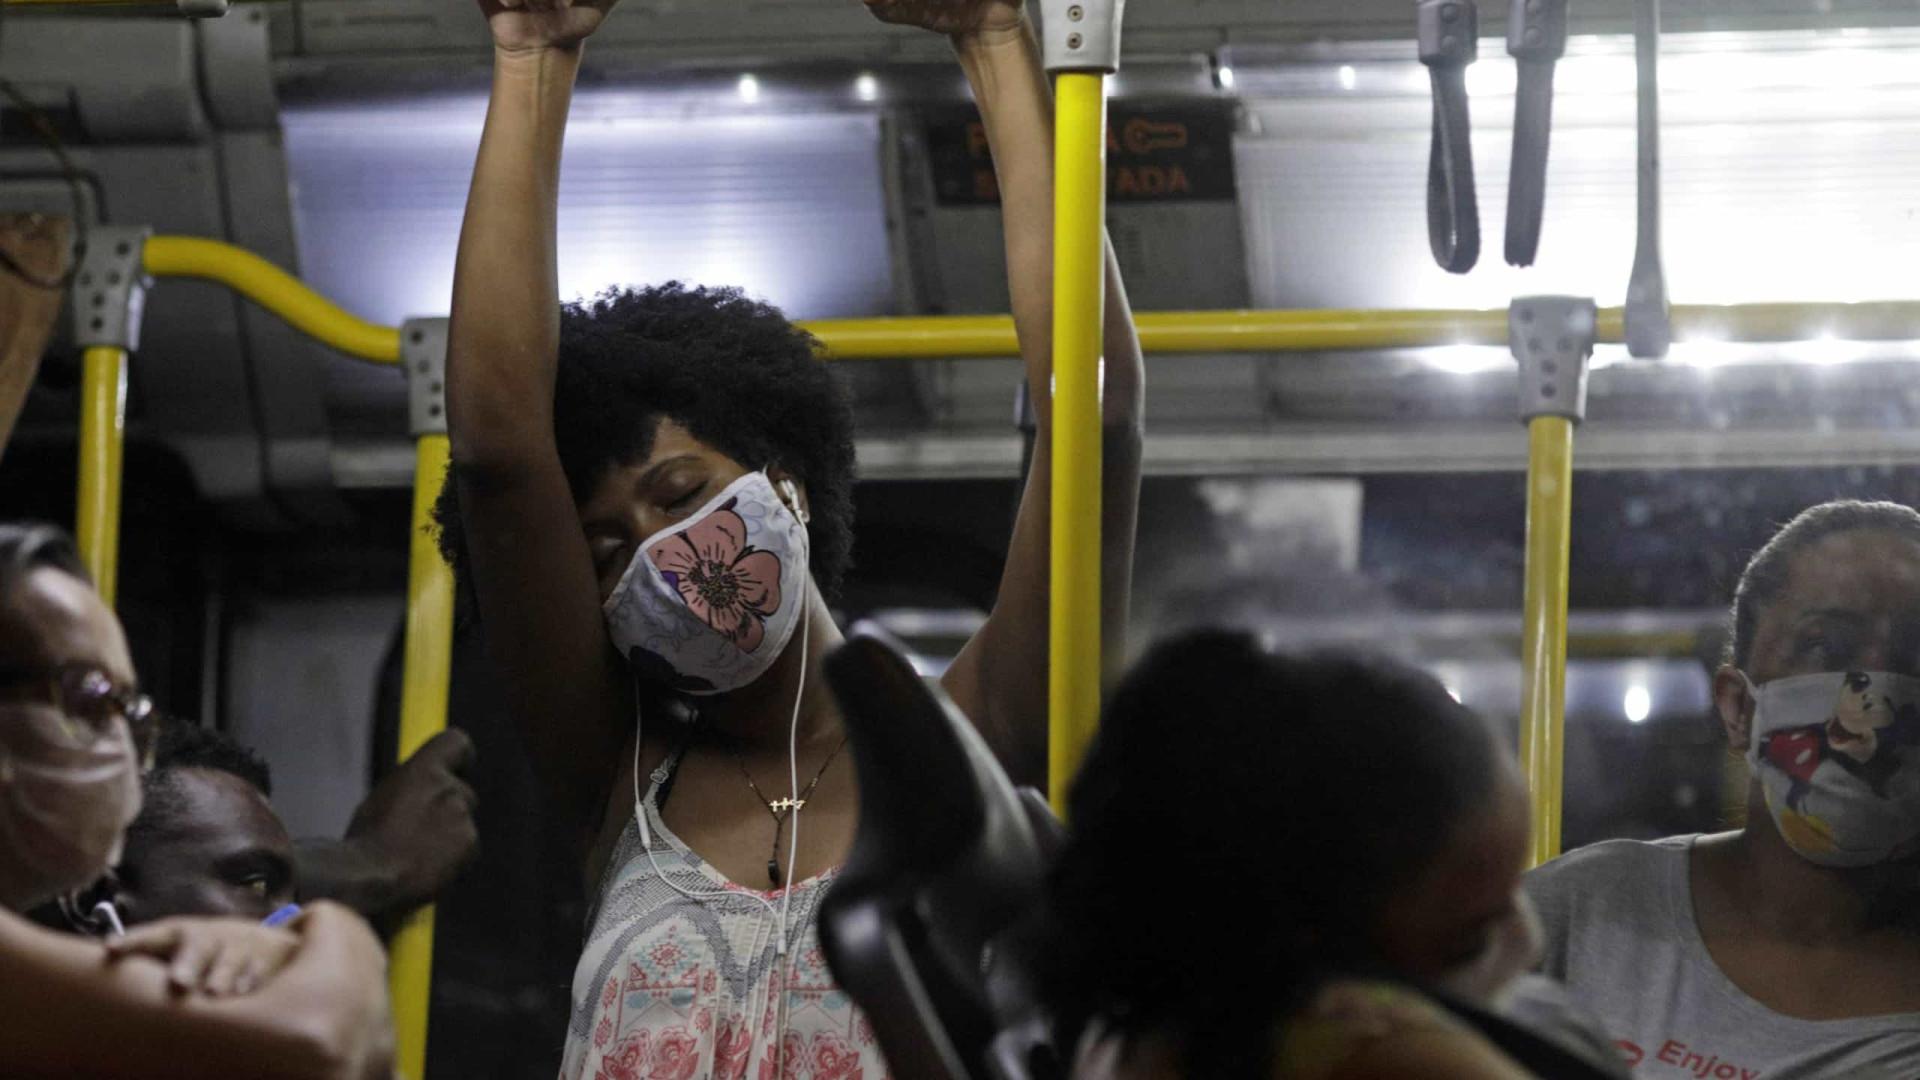 SP supera 4 mil mortos, número de habitantes de pequenas cidades